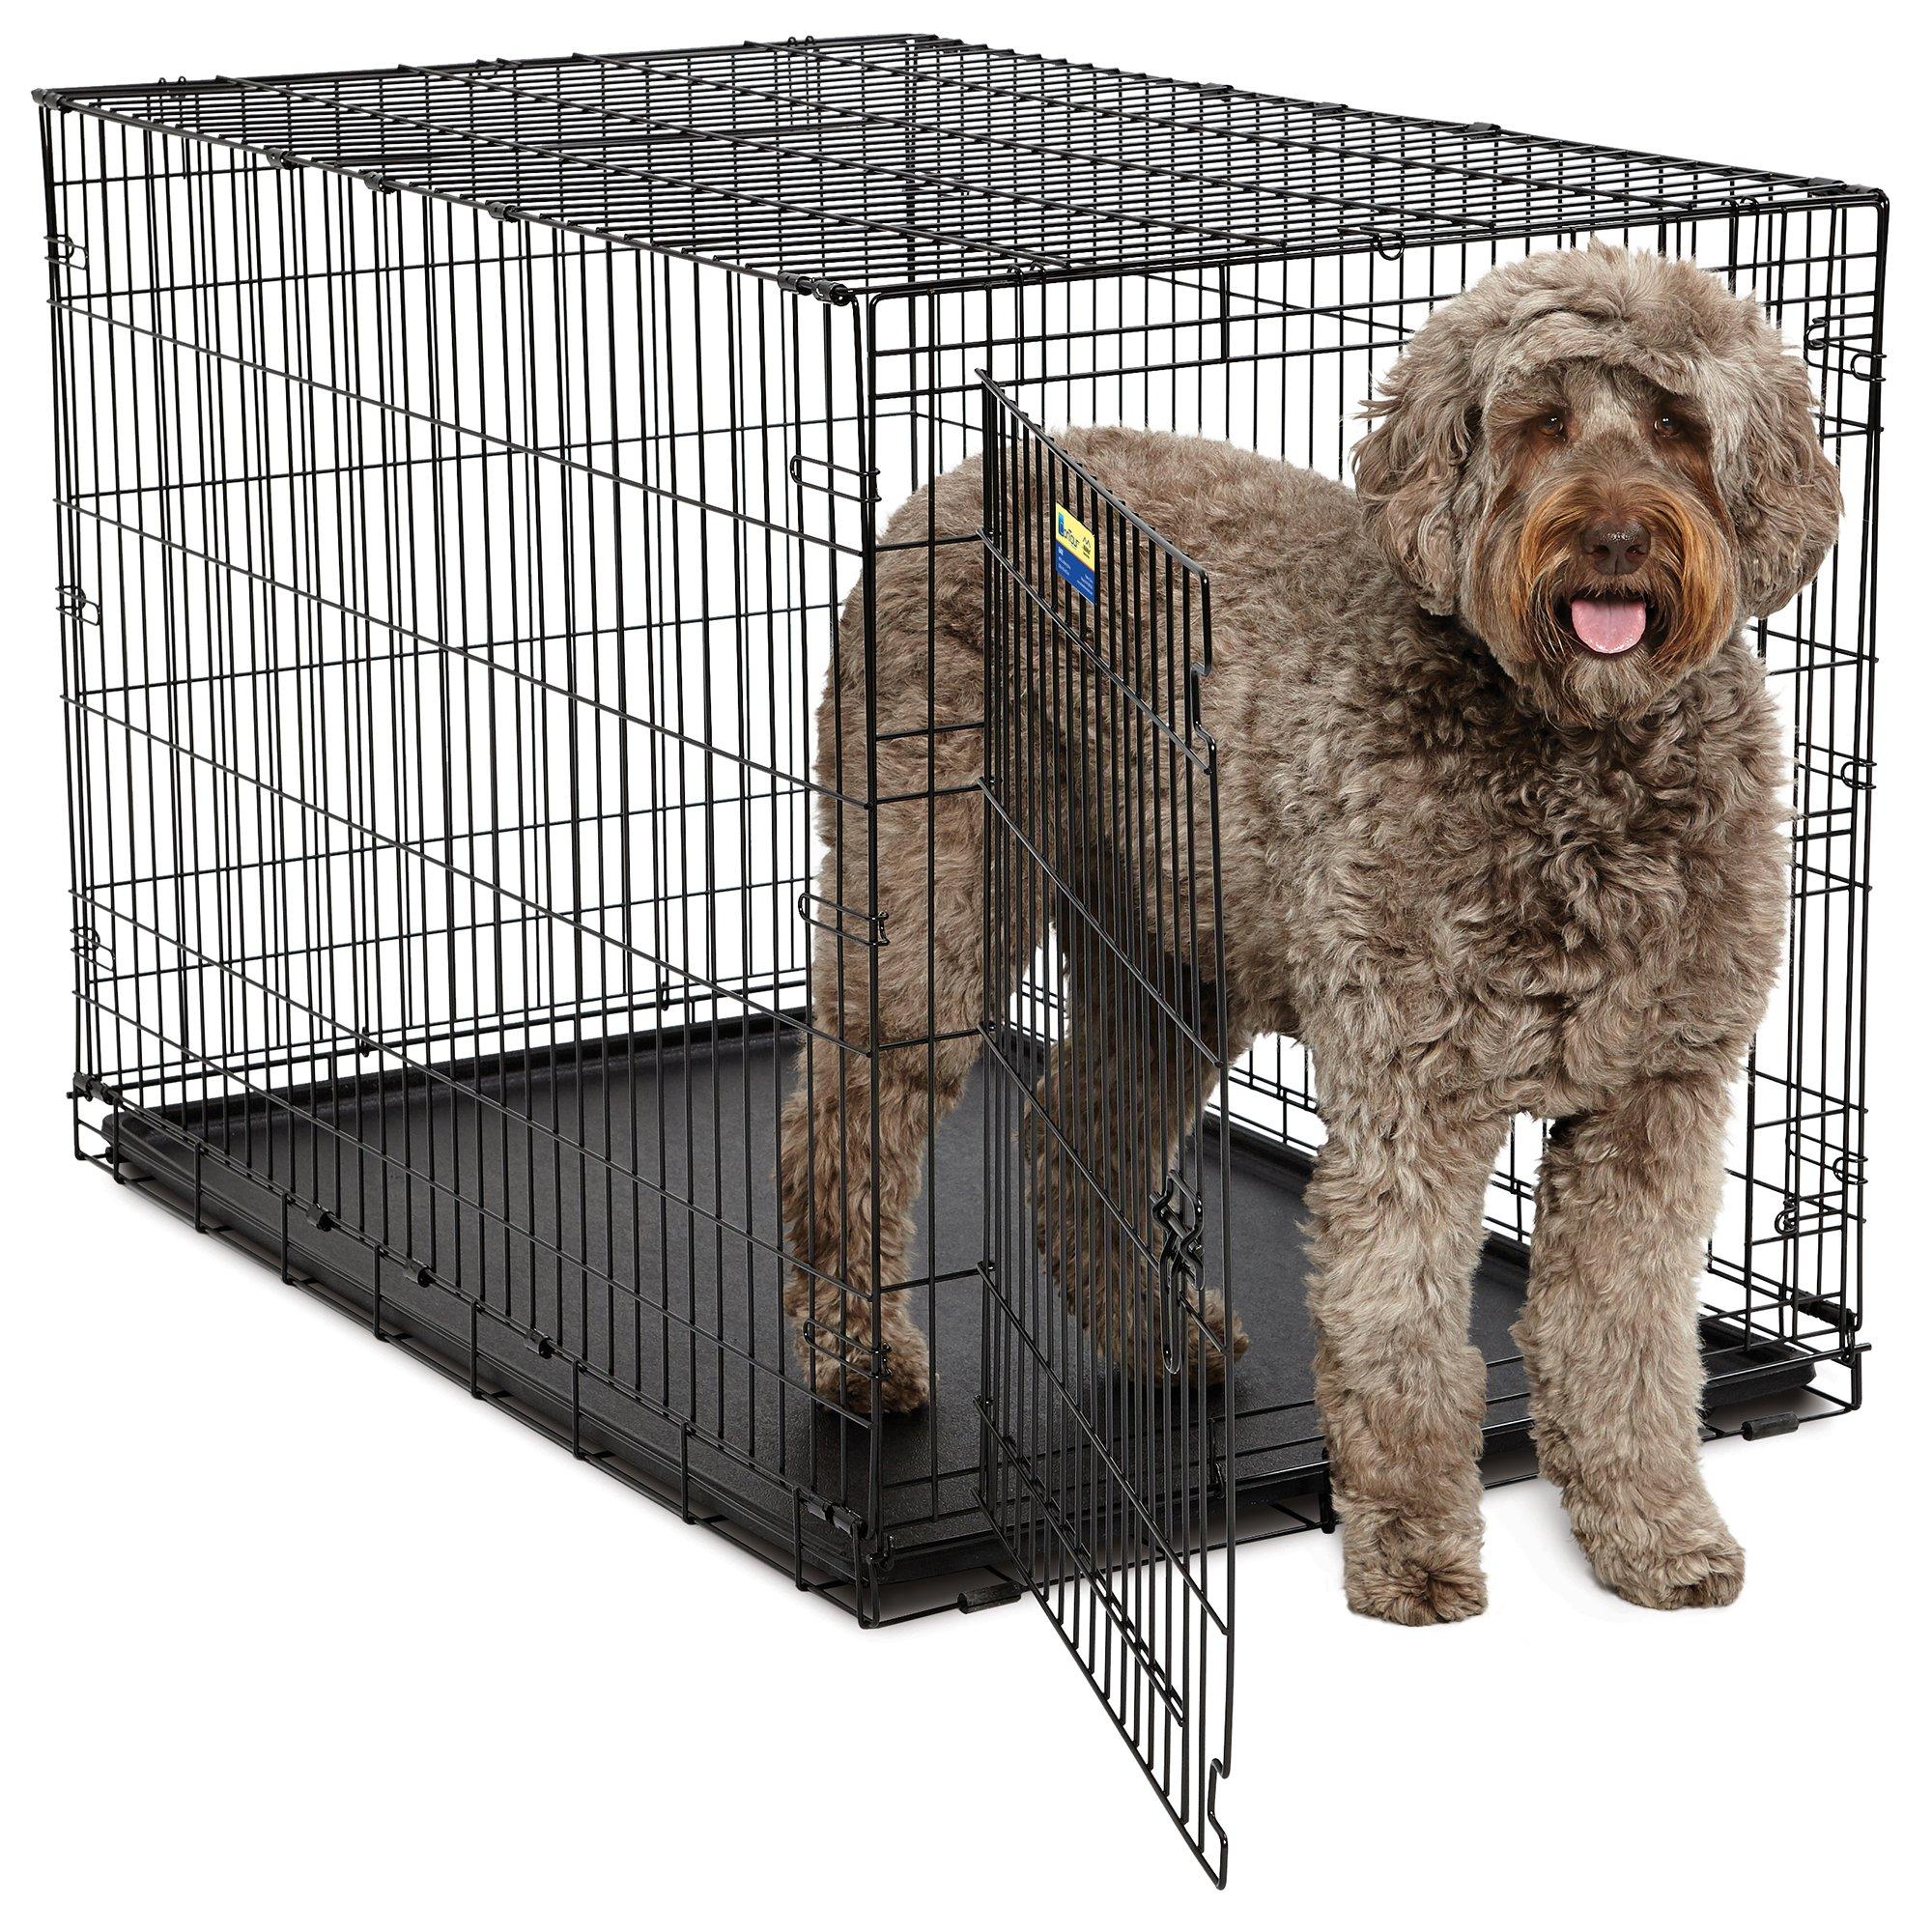 Midwest Contour Folding Dog Crate | Petco